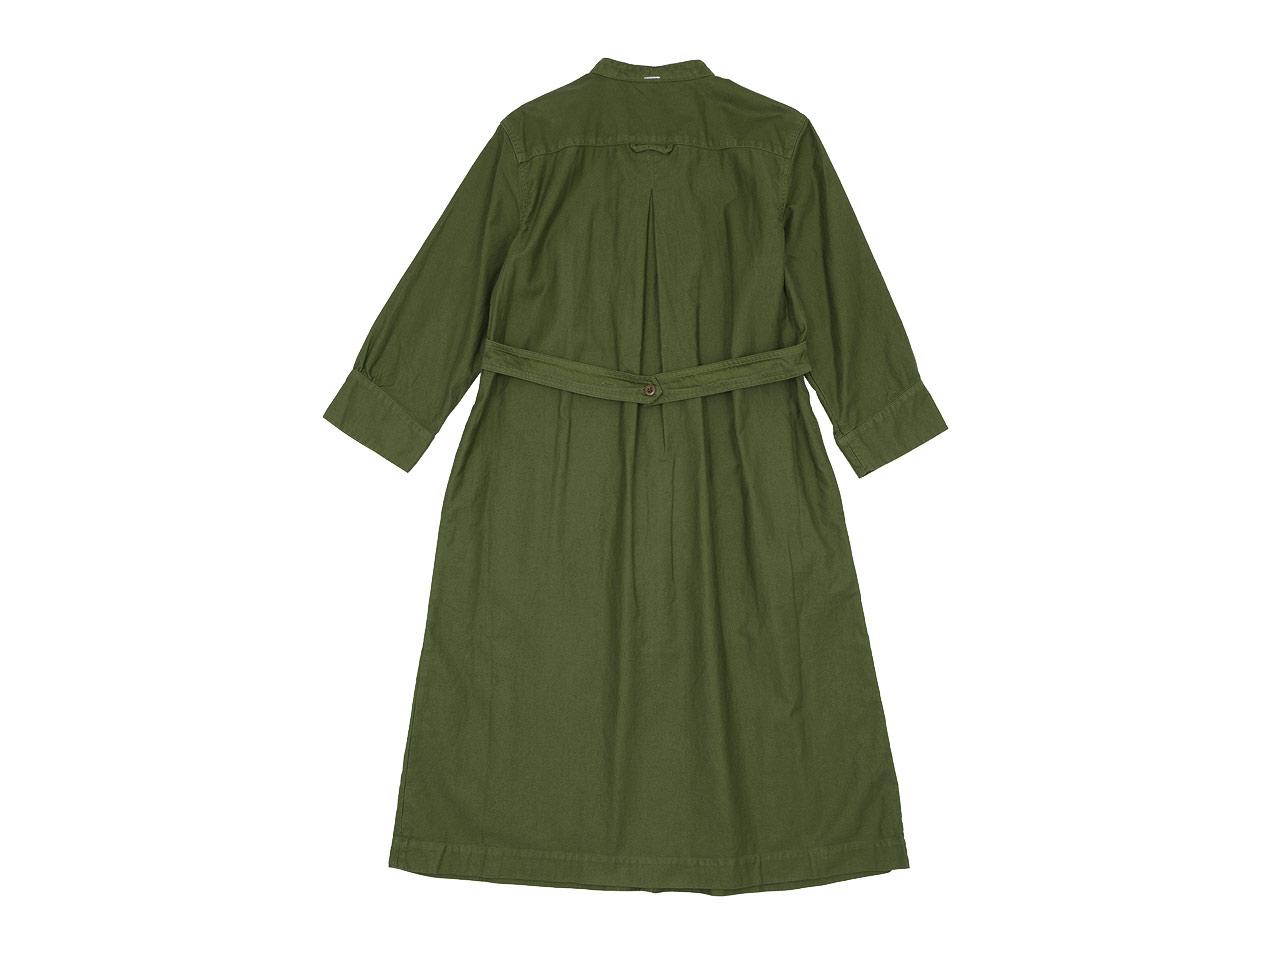 MHL. LIGHT MOLESKIN CHORE DRESS